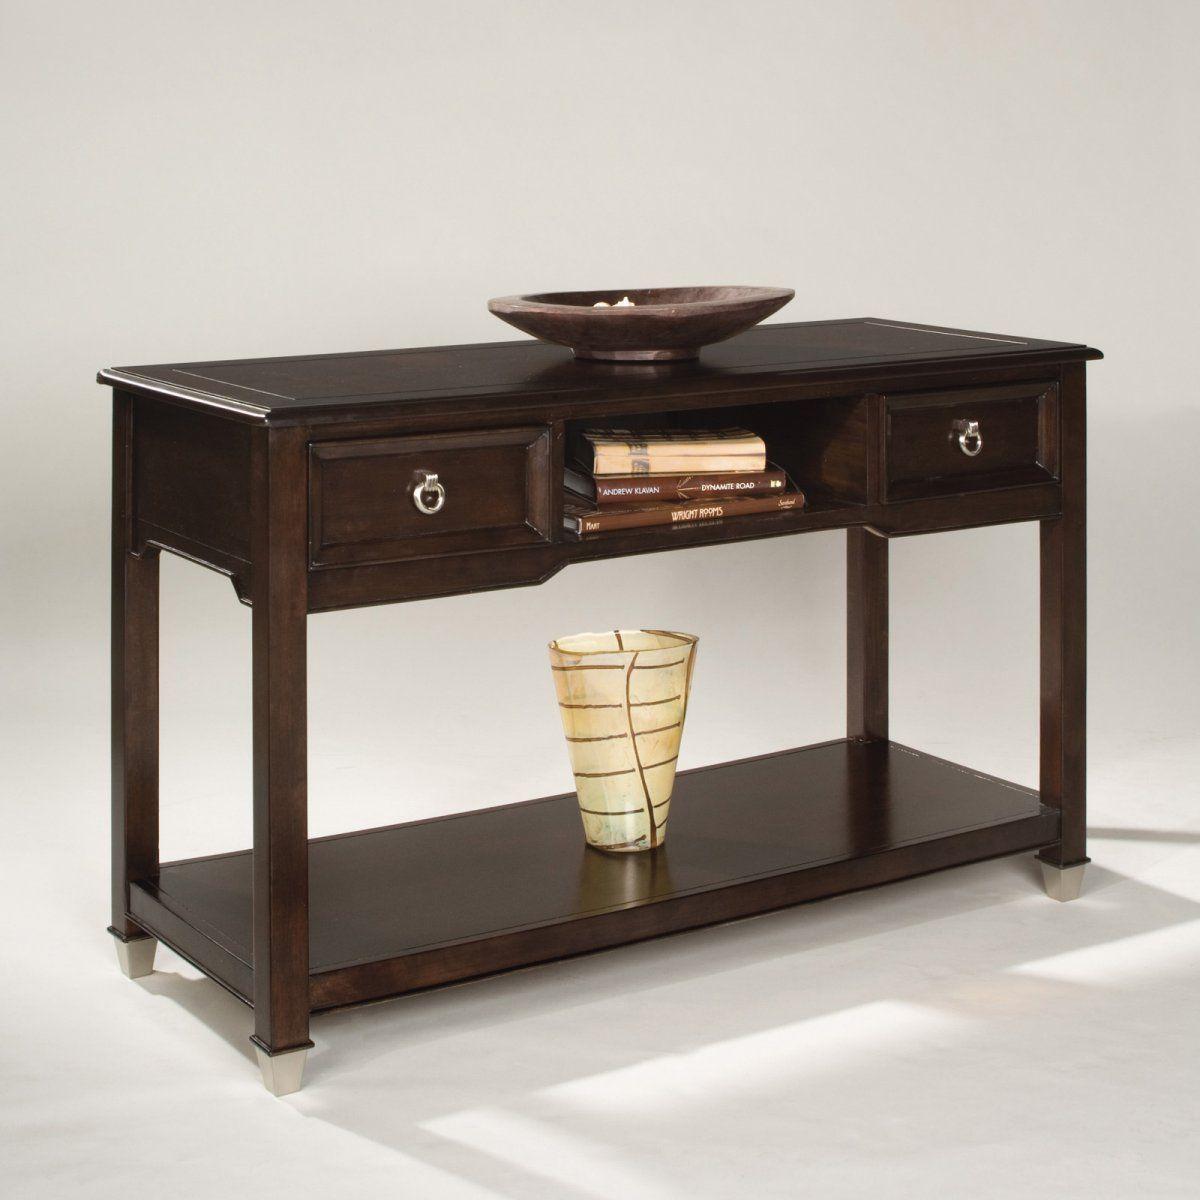 Chesterfield Sofa Magnussen T Darien Wood Rectangular Console Table